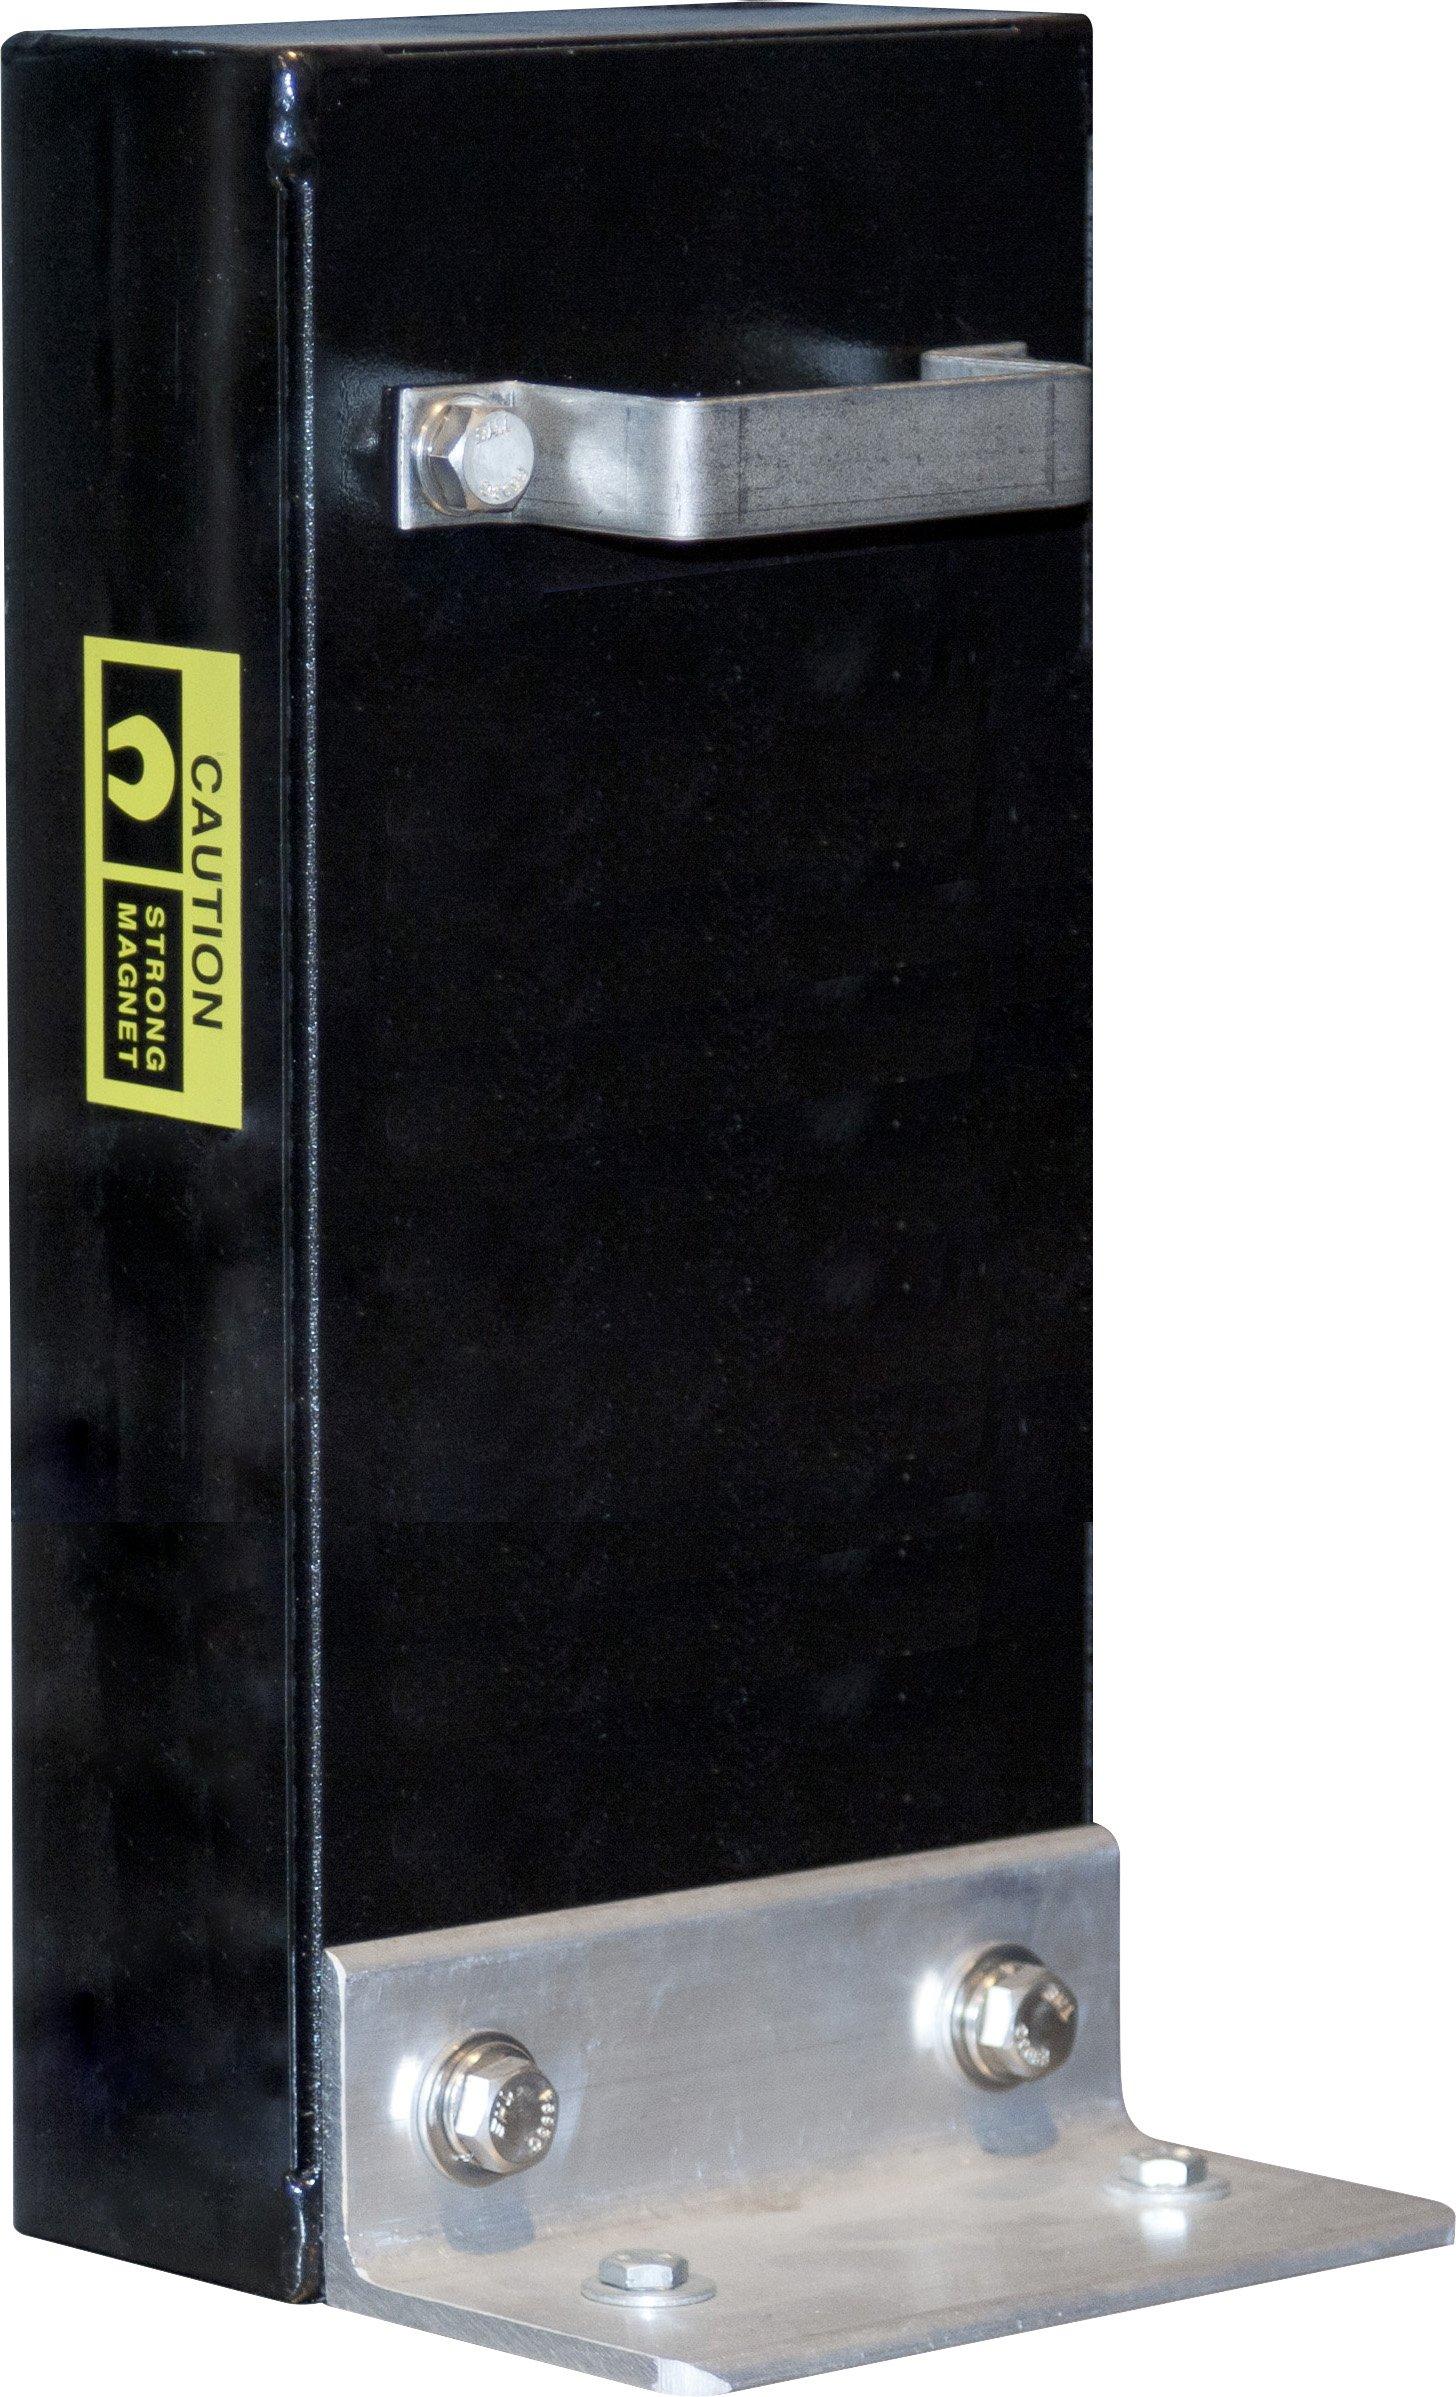 MAG-MATE MGF12 Magnetic Sheet Fanner/Separator, 12-22 Gauge/12''/lb